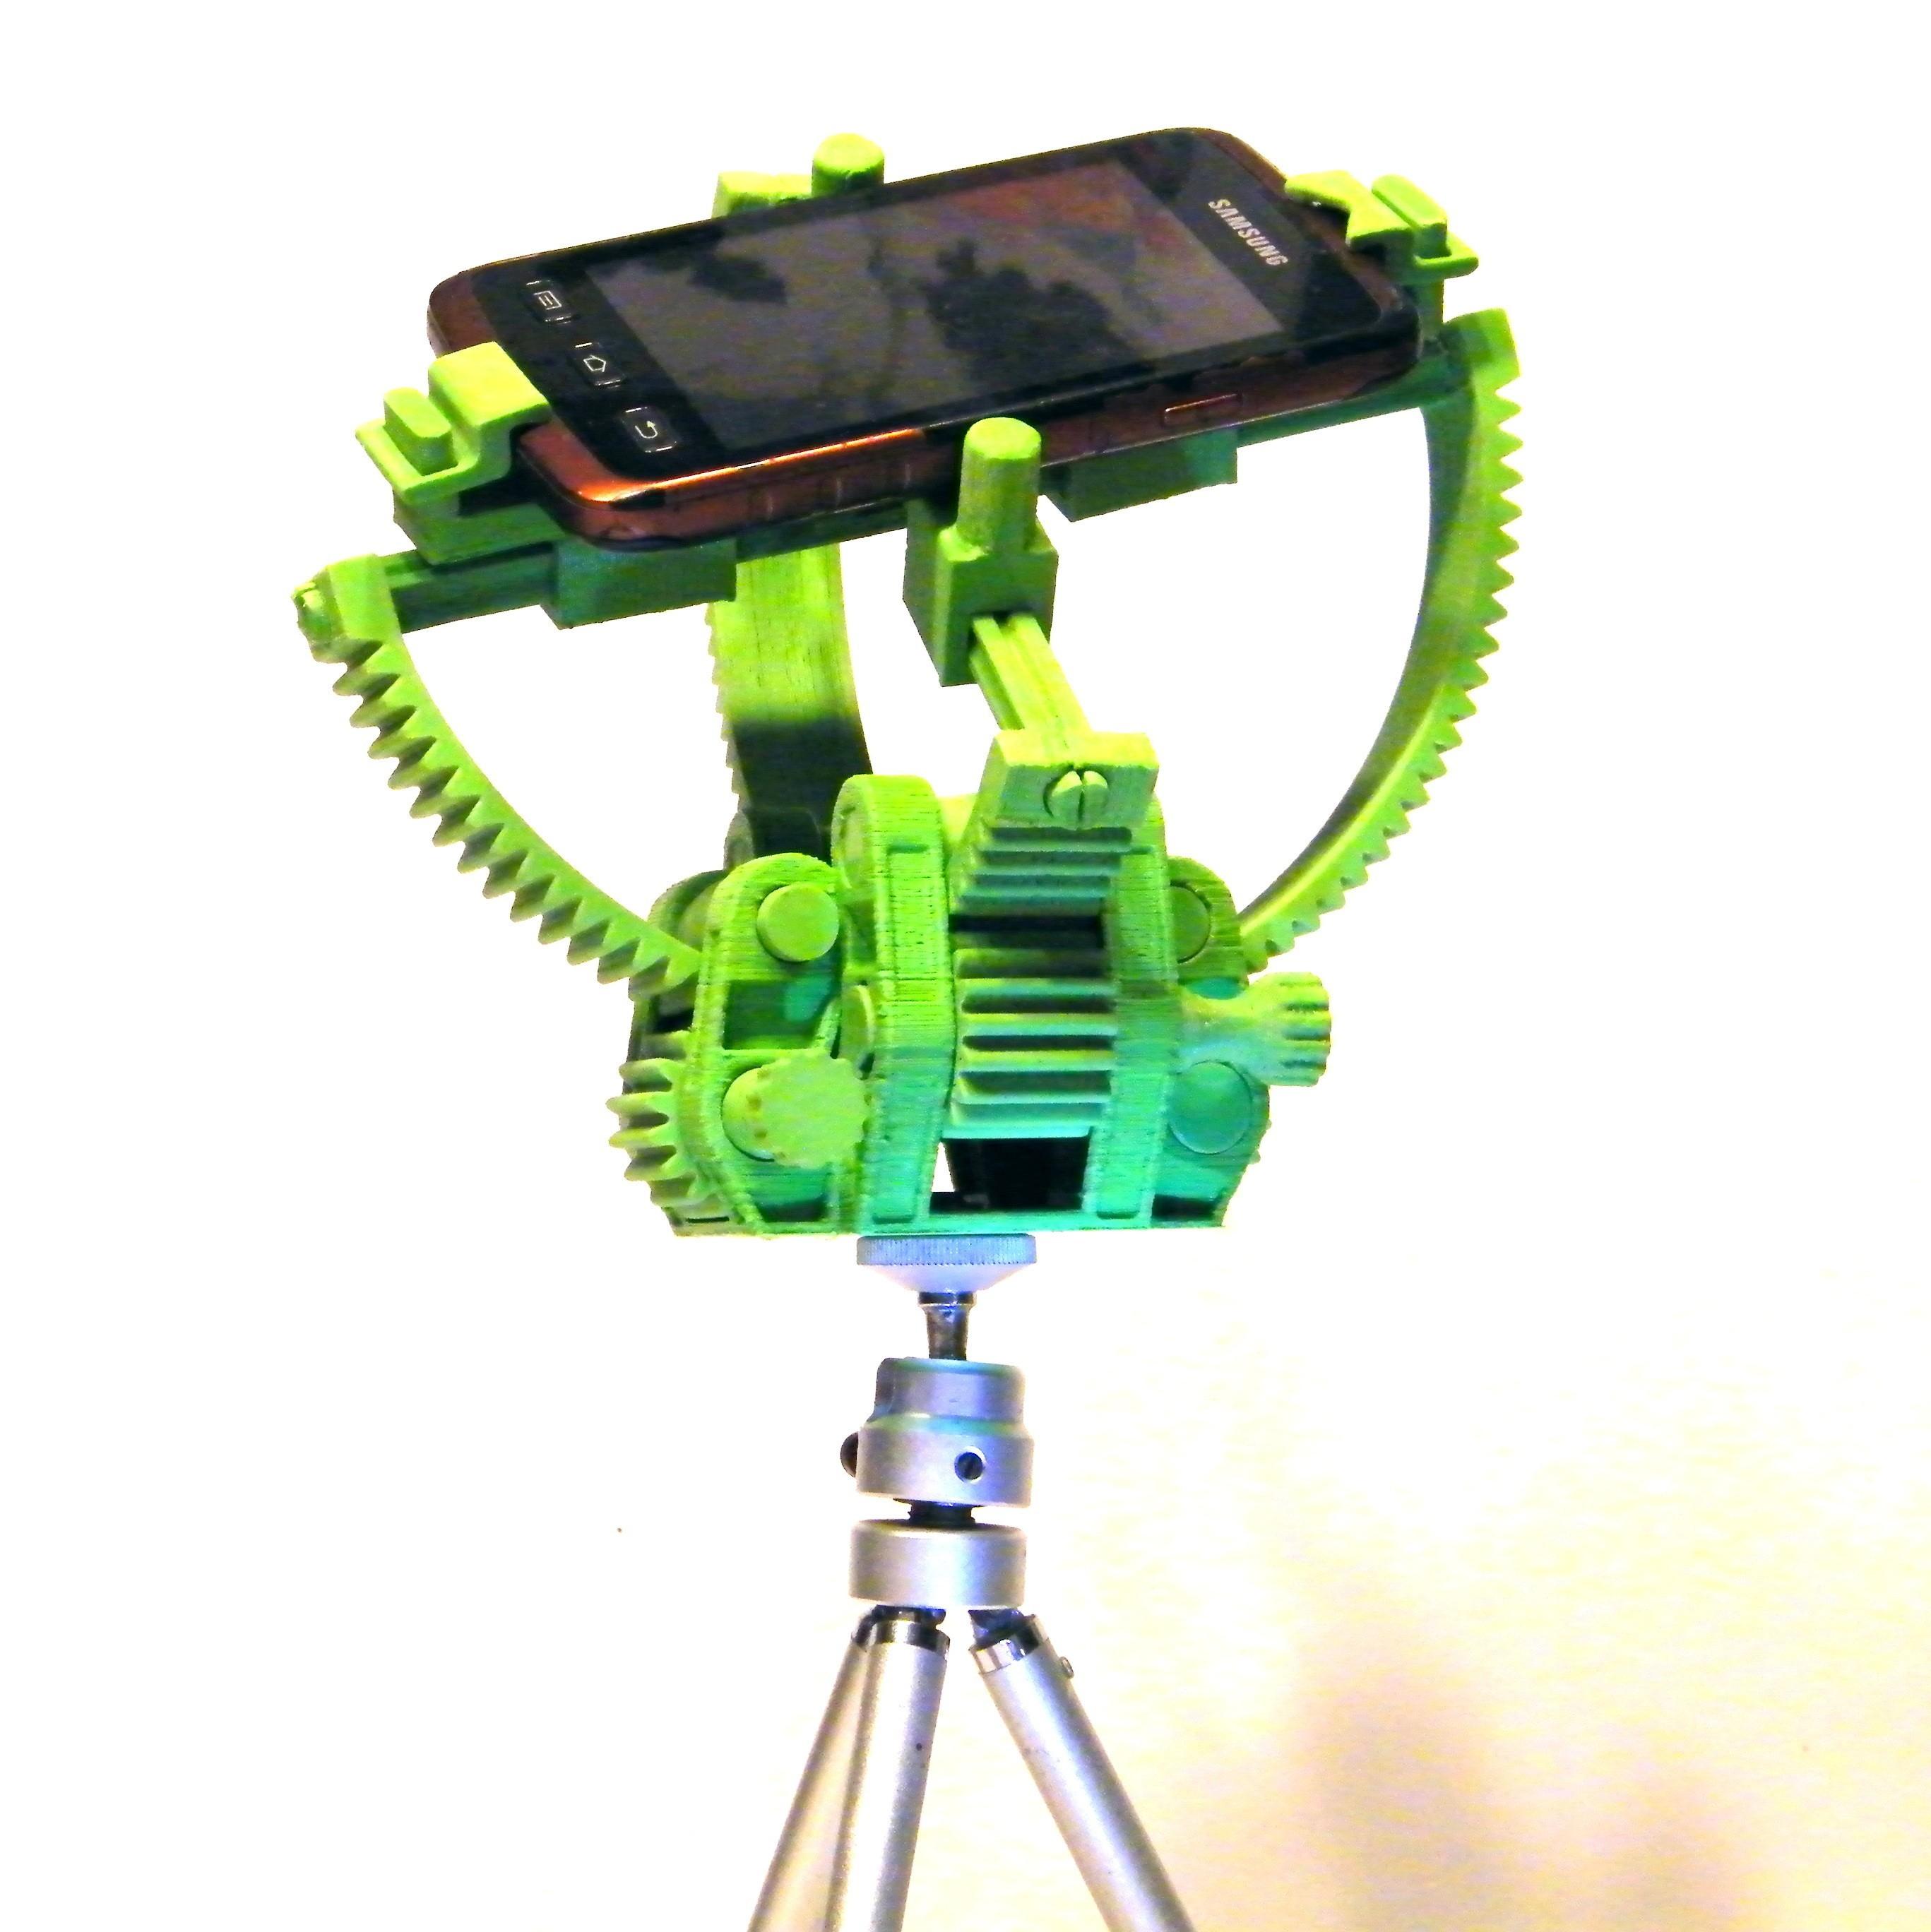 Armillary_phone_tripod.jpg Download STL file Armillary phone Holder • Design to 3D print, 3d-fabric-jean-pierre